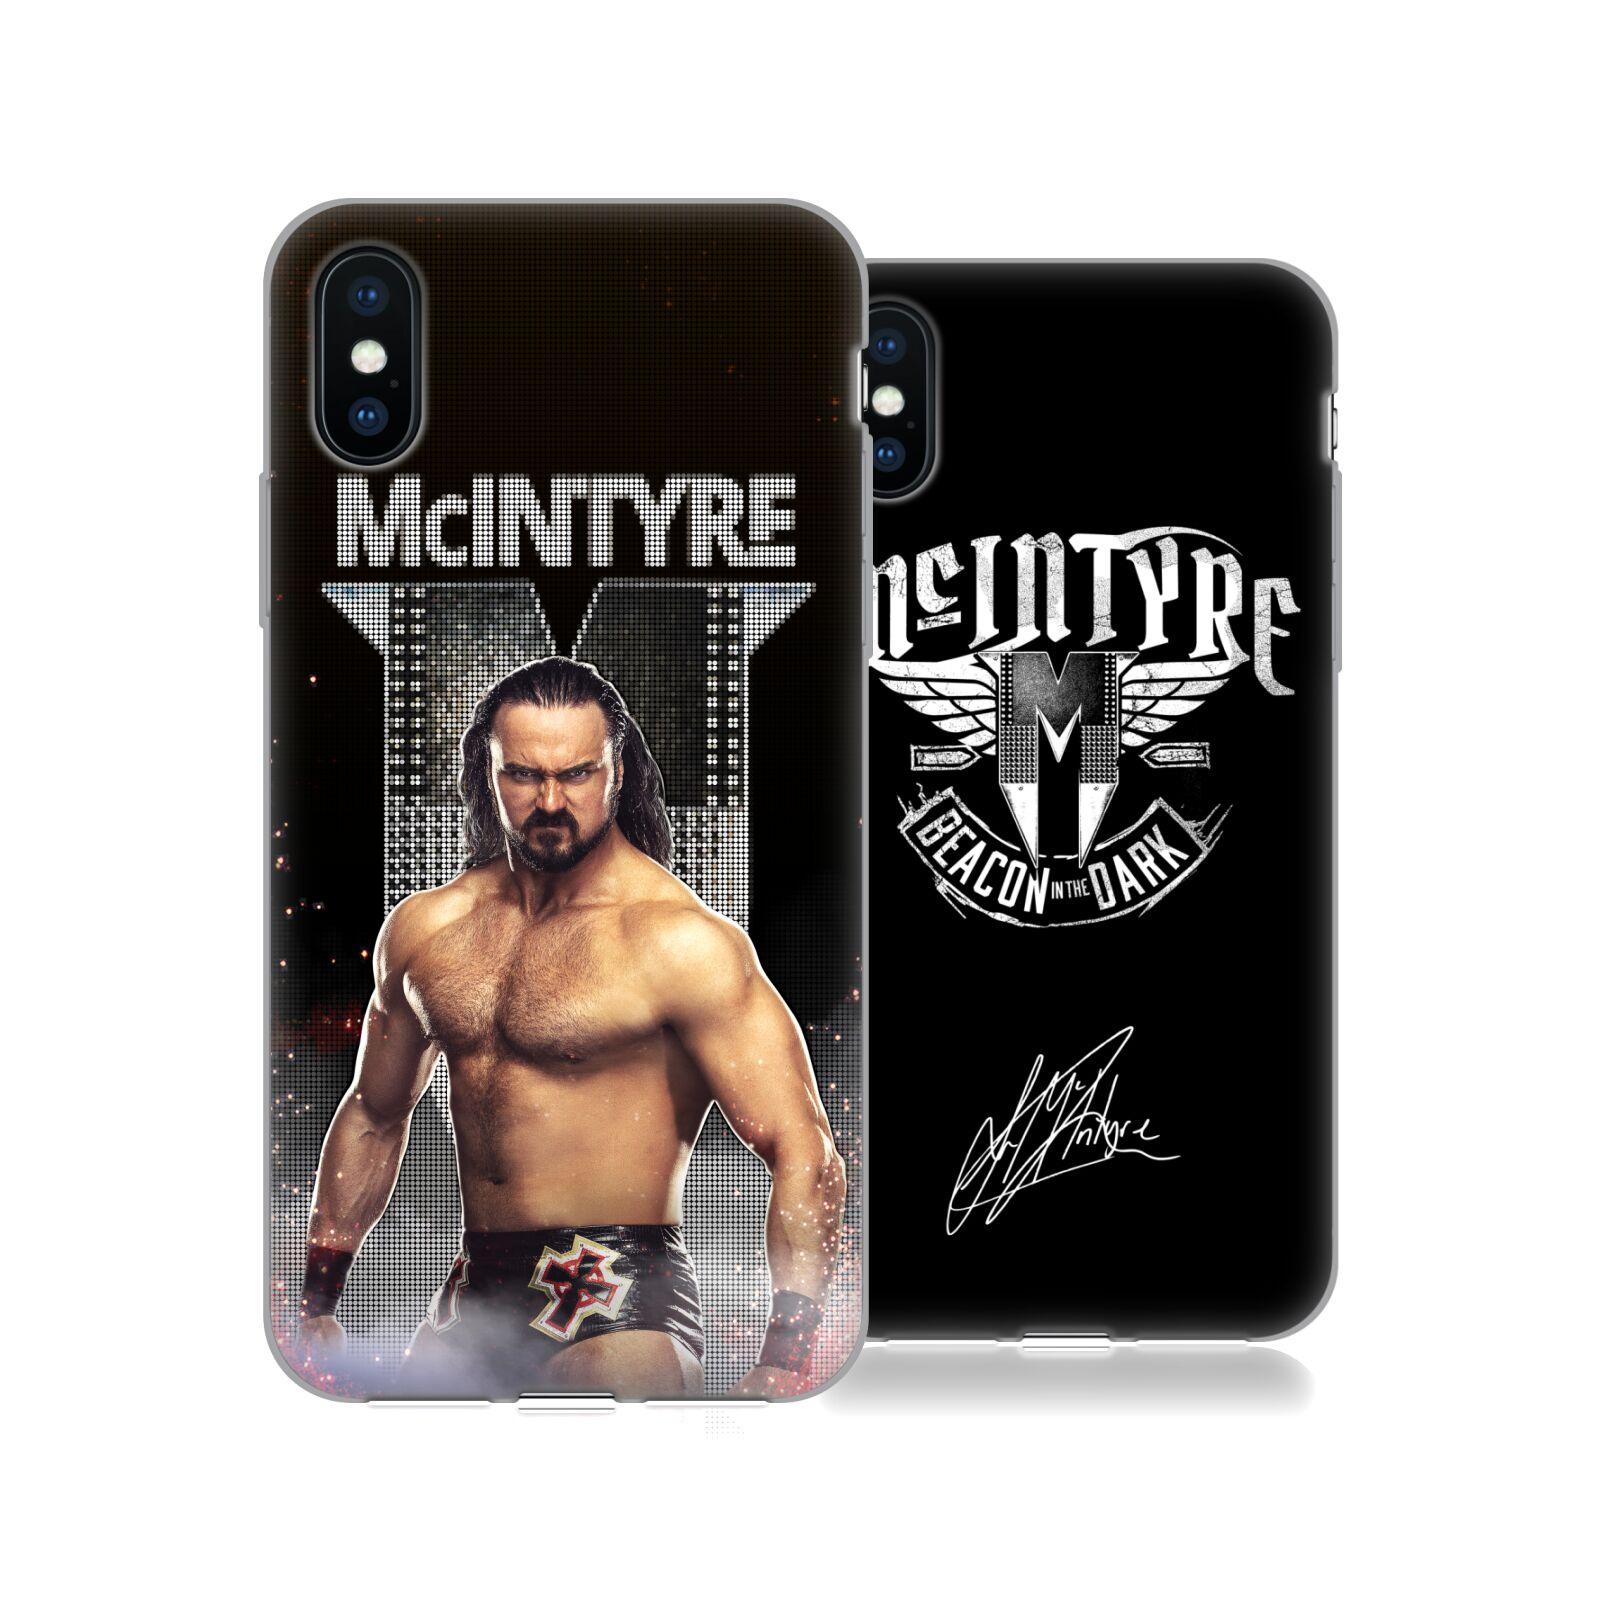 WWE <!--translate-lineup-->Drew McIntyre<!--translate-lineup-->